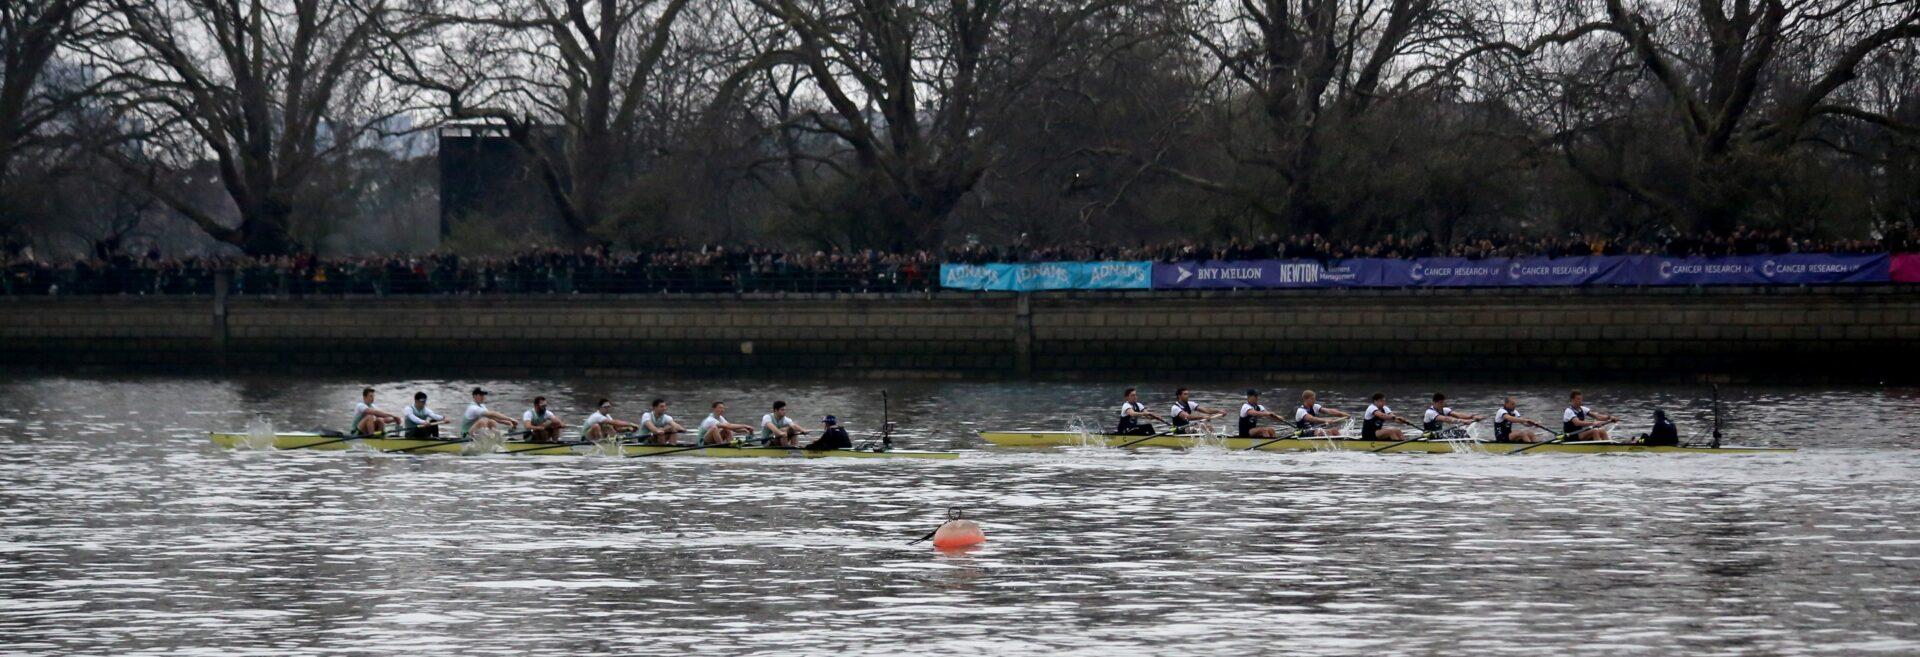 Men's Blues race at the 2018 Boat Race